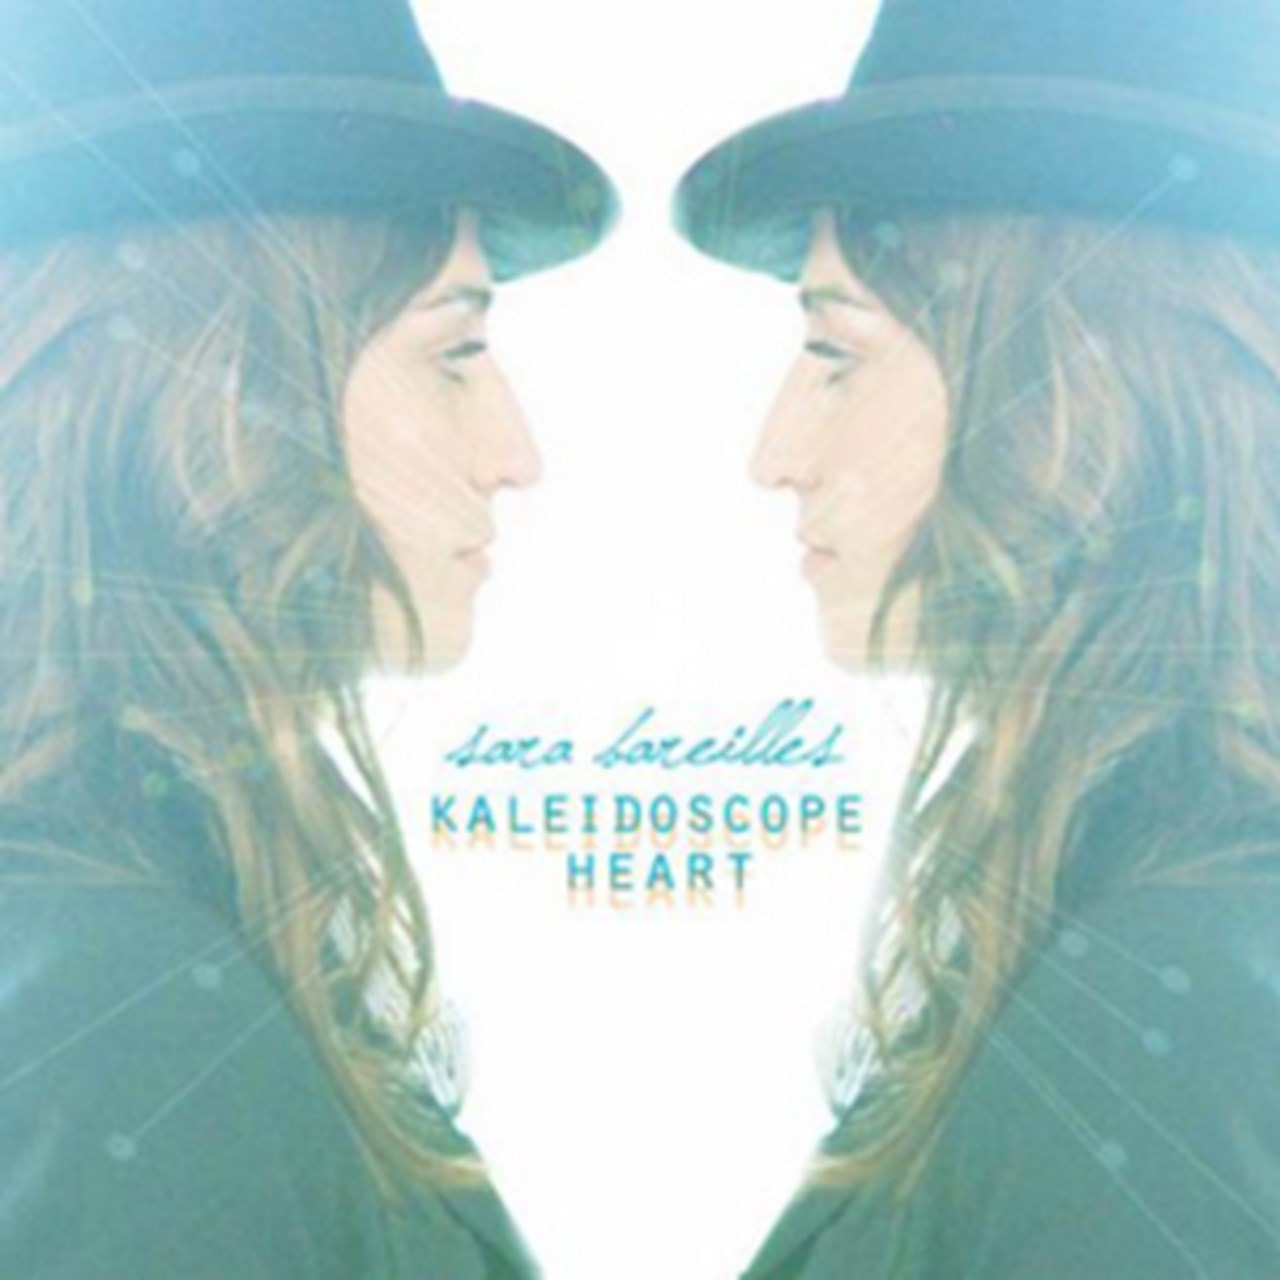 Kaleidoscope Heart - 1